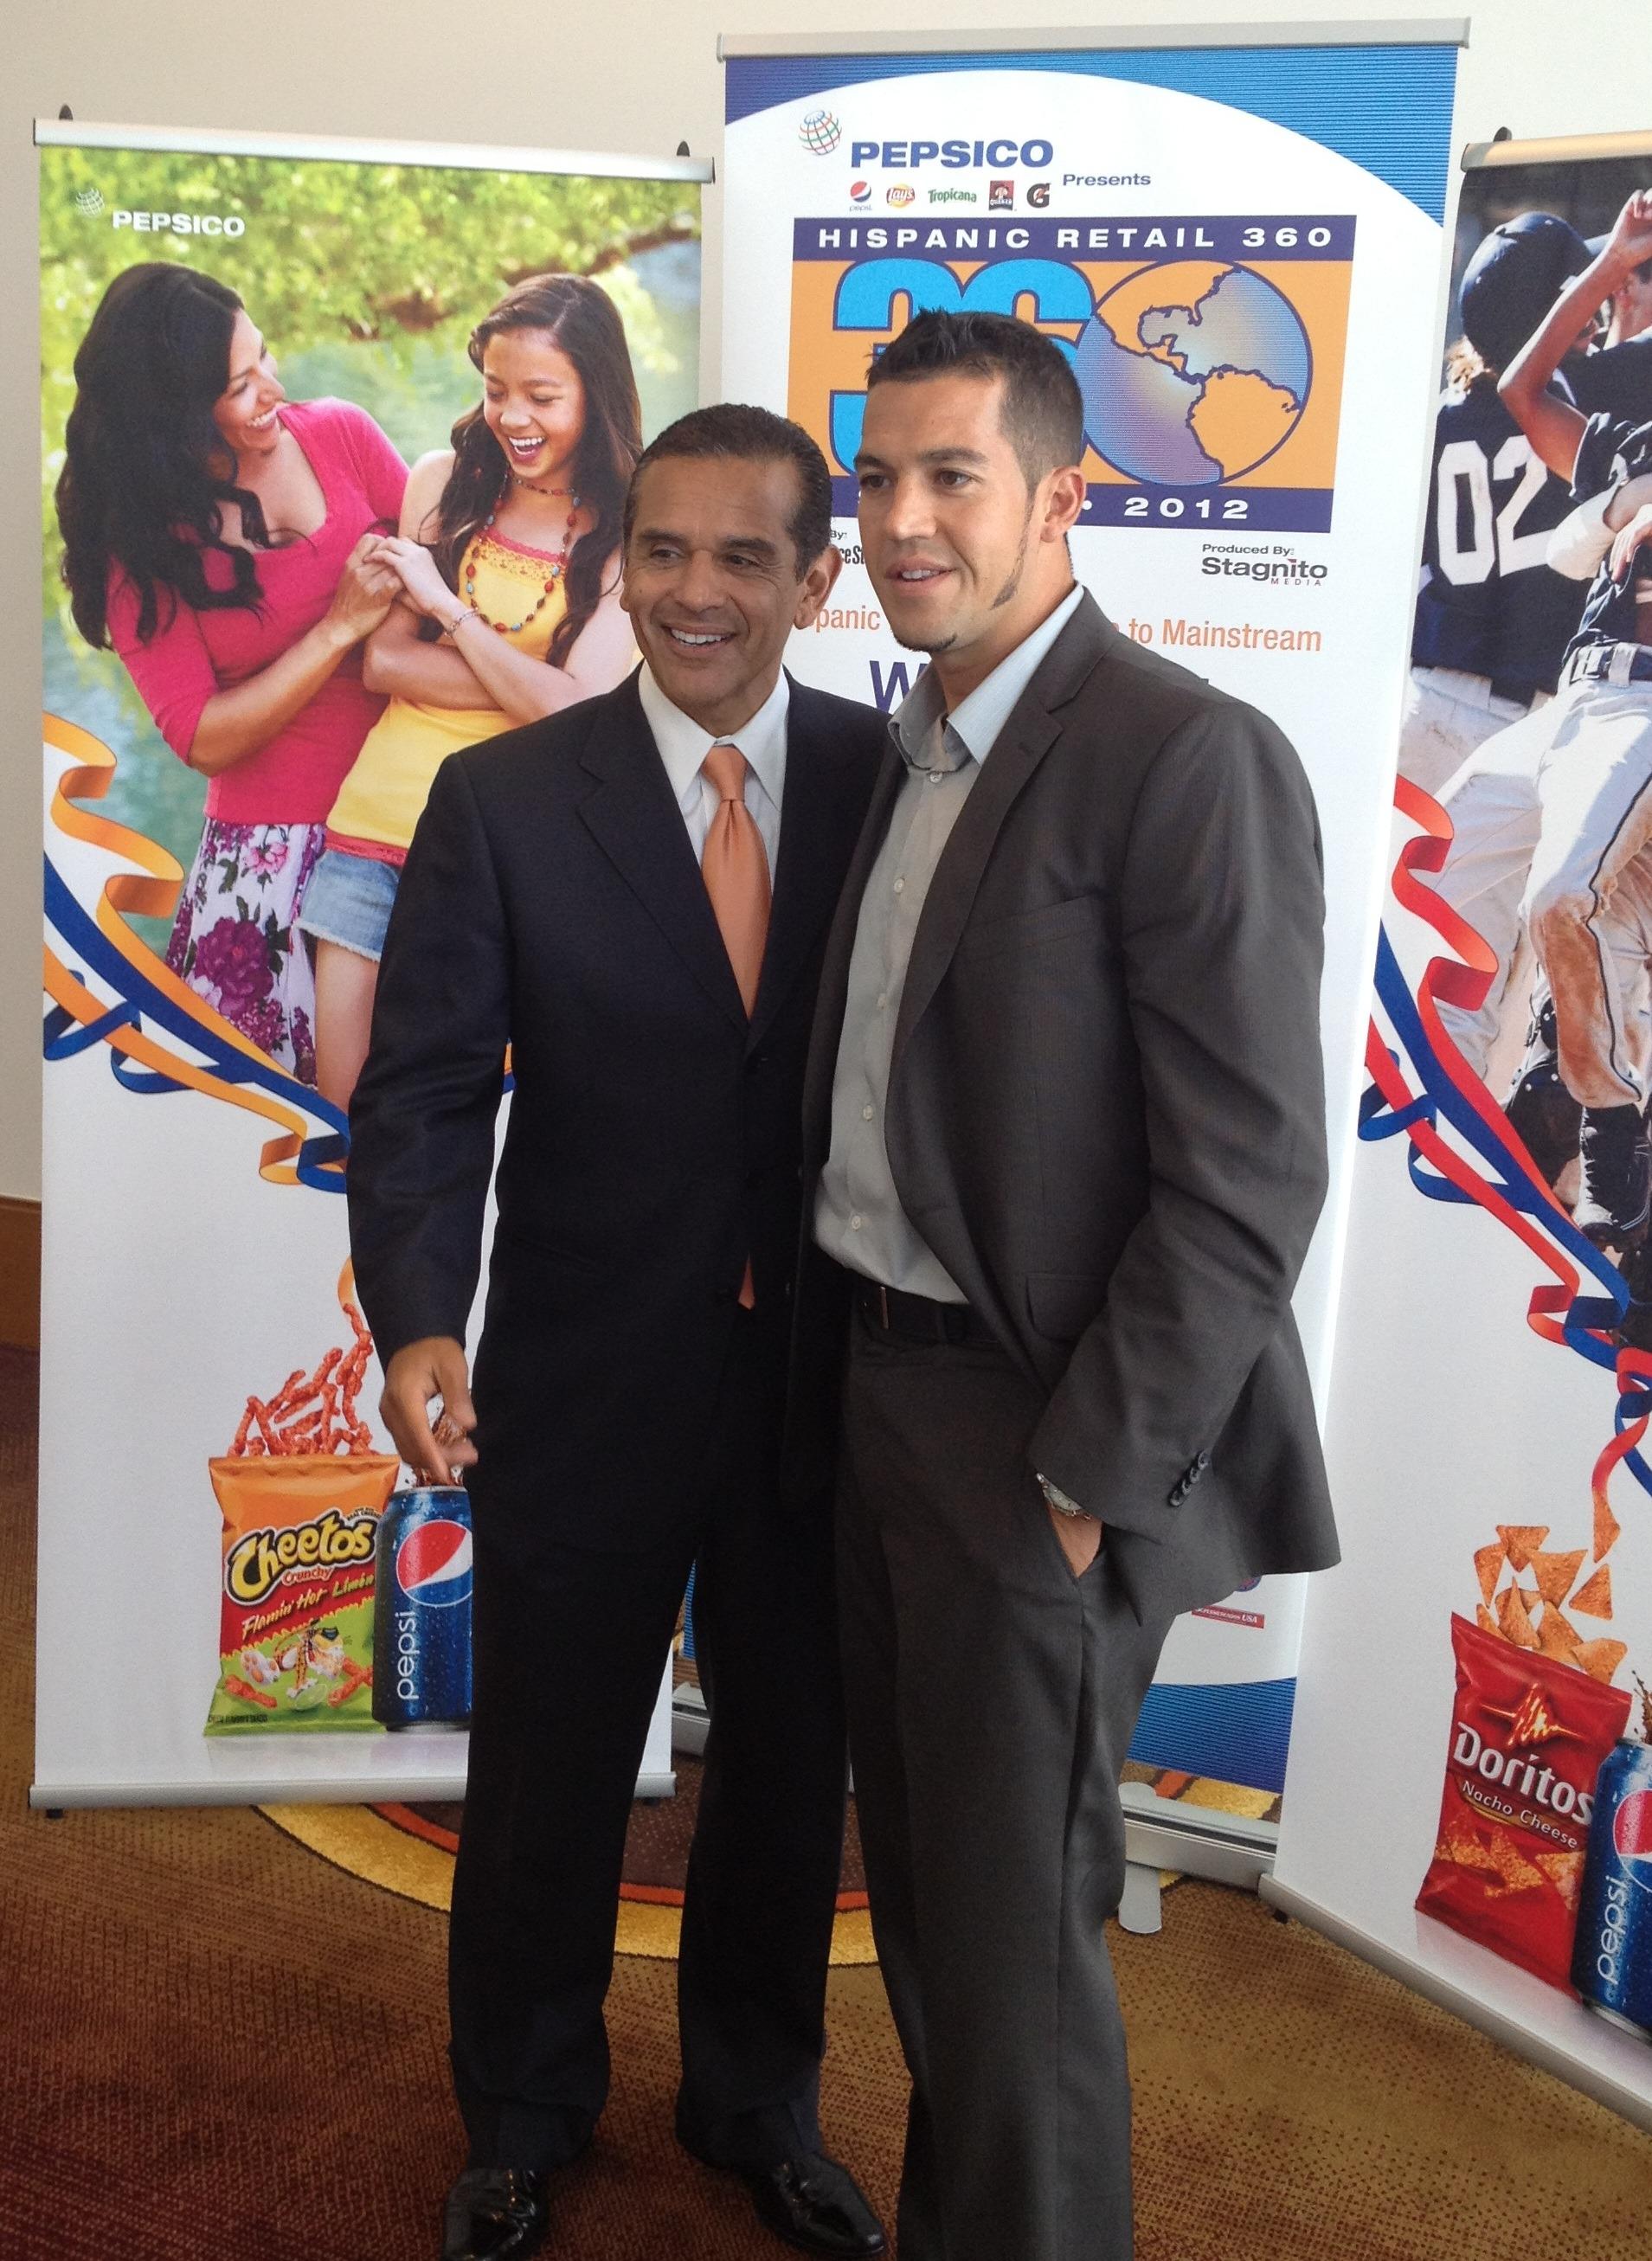 Mayor Villaraigosa and Eric Diaz